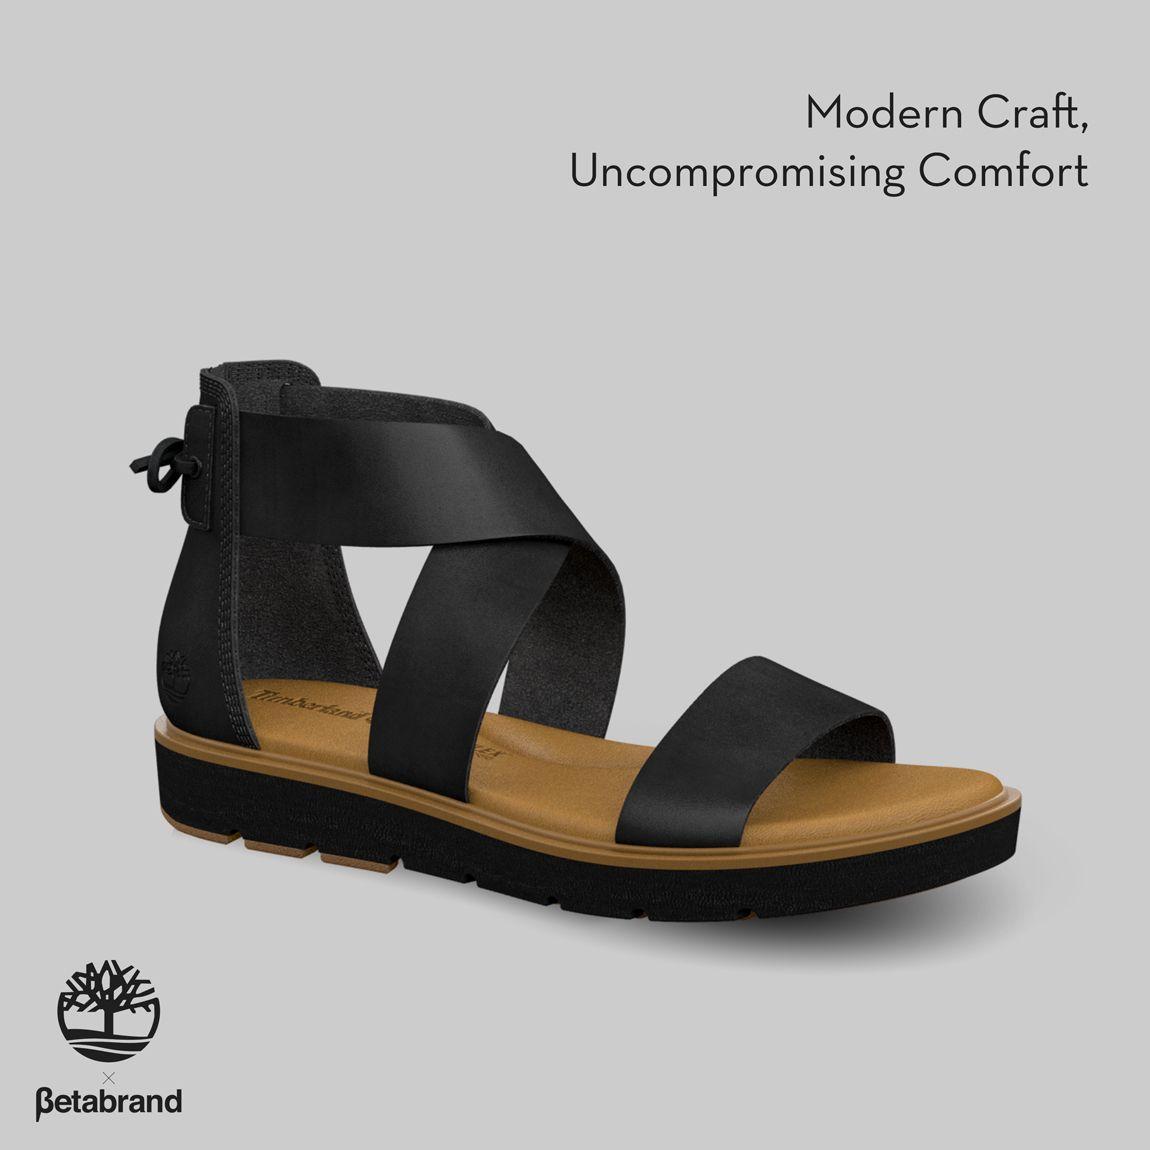 Timberland Gladiator Sandals (Black